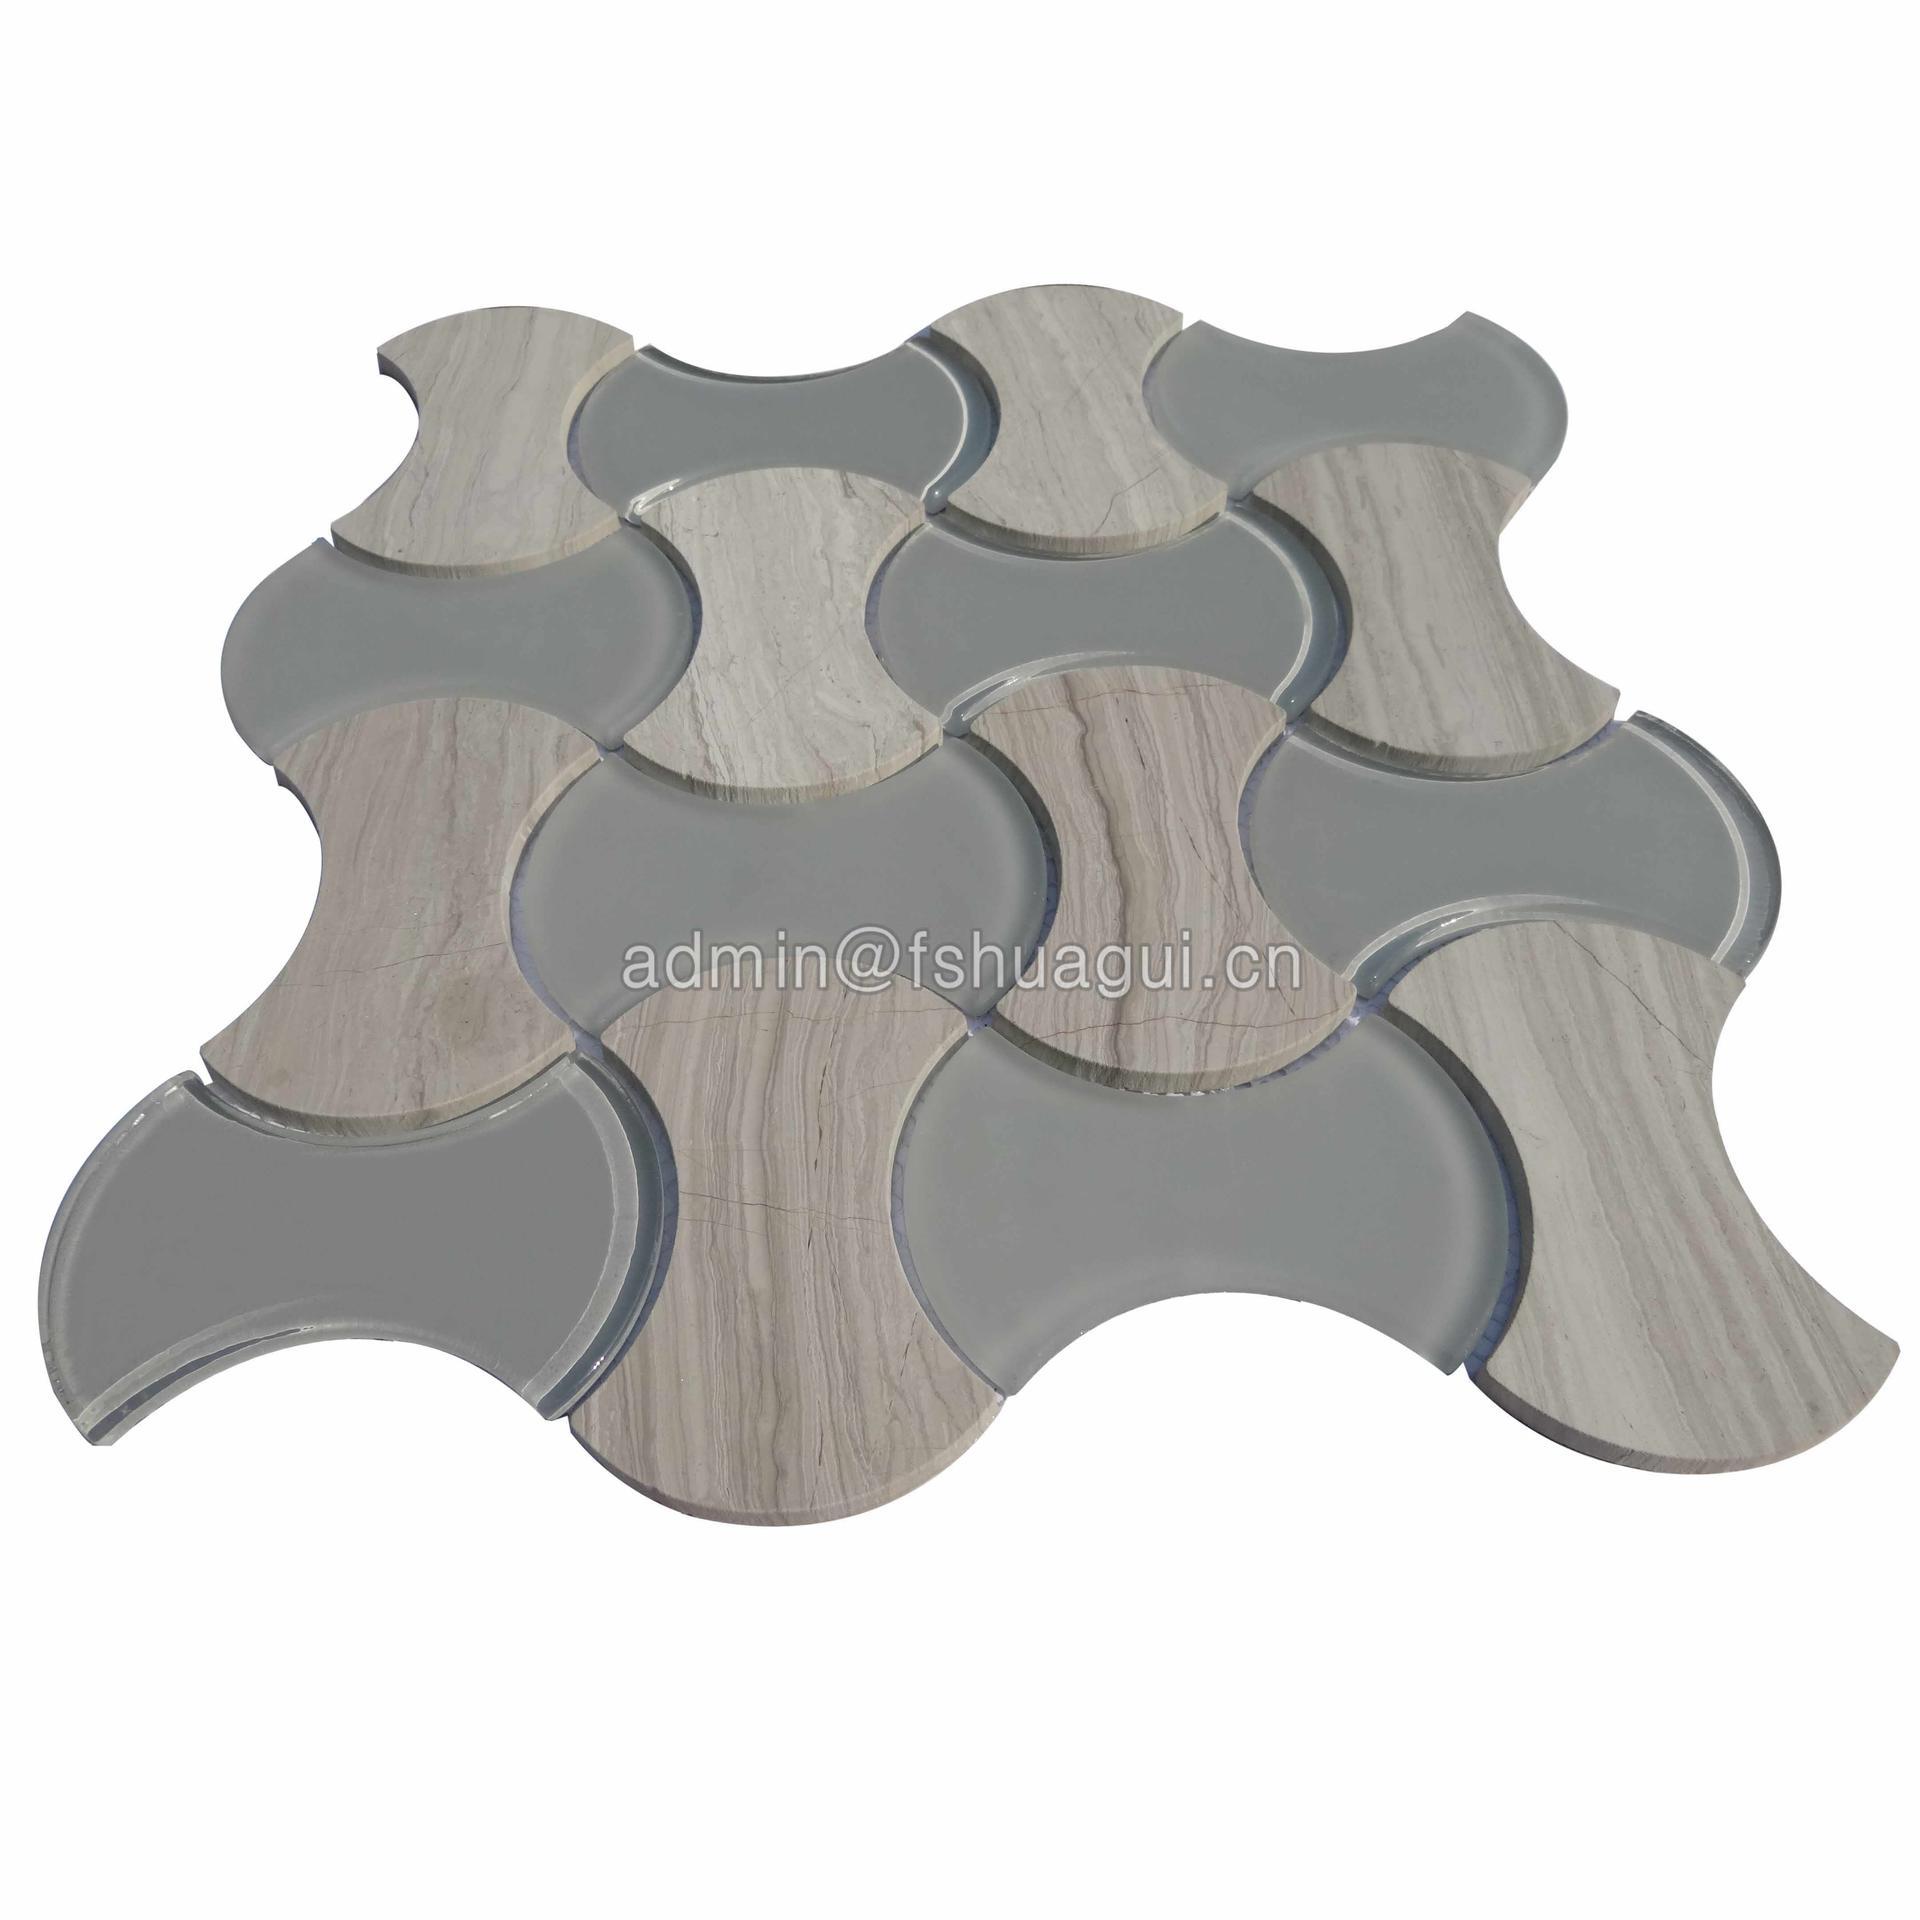 High quality design water jet stone mixed glass mosaic backsplash tile